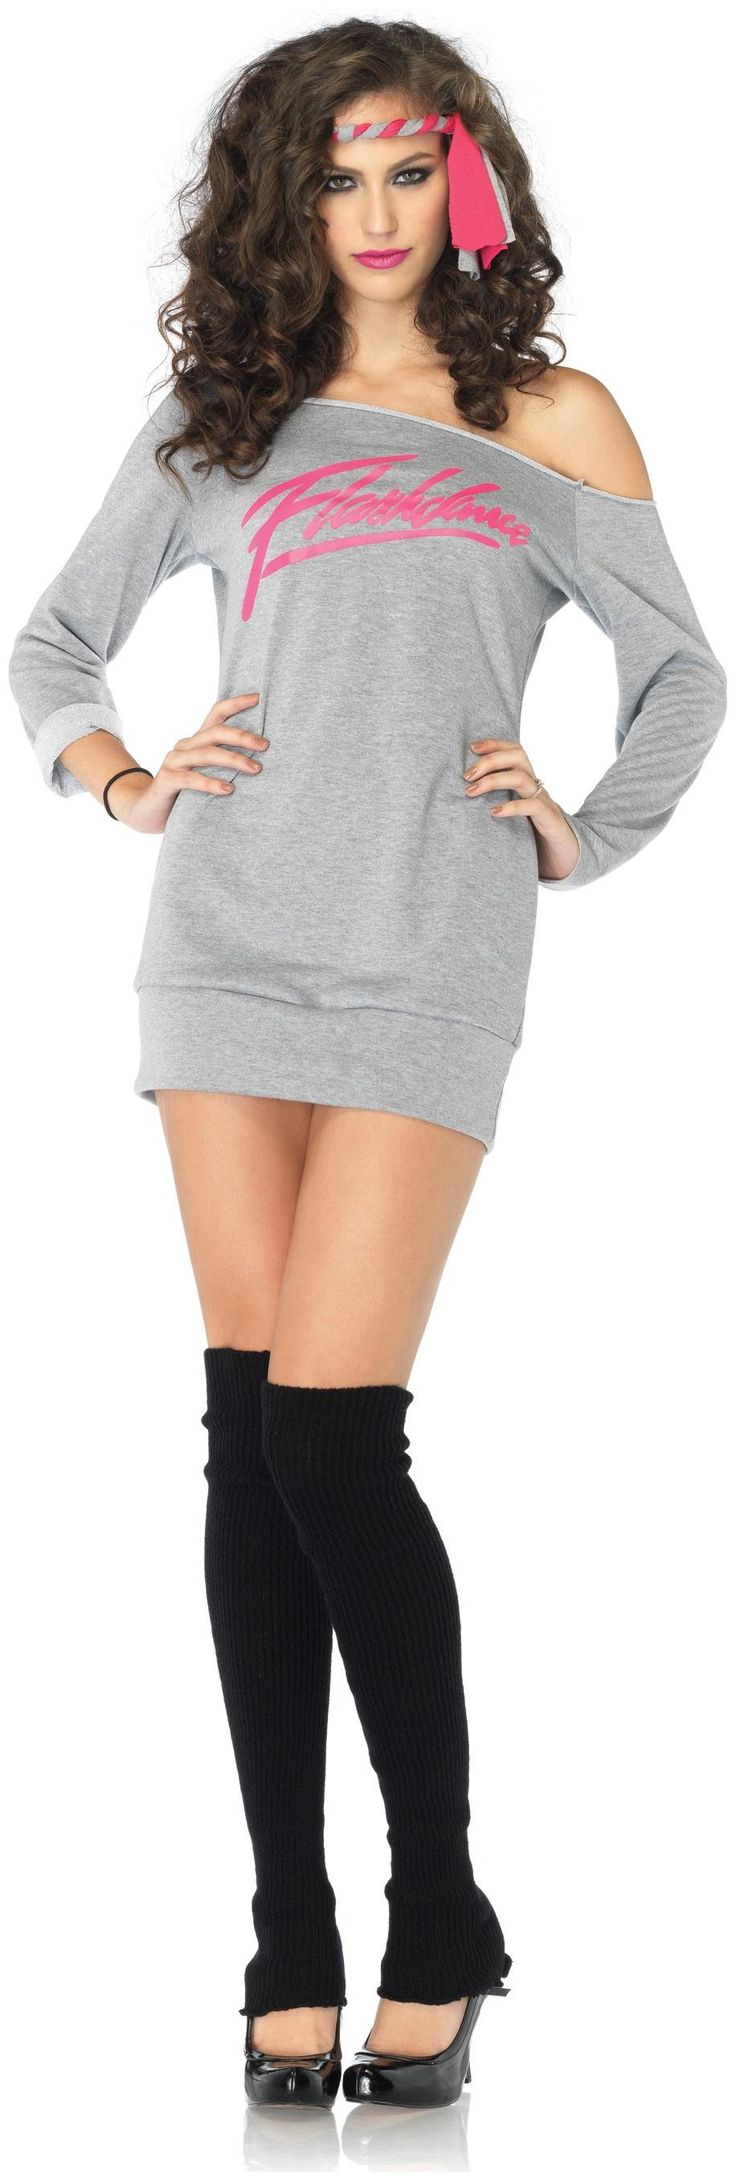 Flashdance - Sweatshirt Dress Adult Costume #halloweencostume #costume #halloween #adultcostume #womencostume